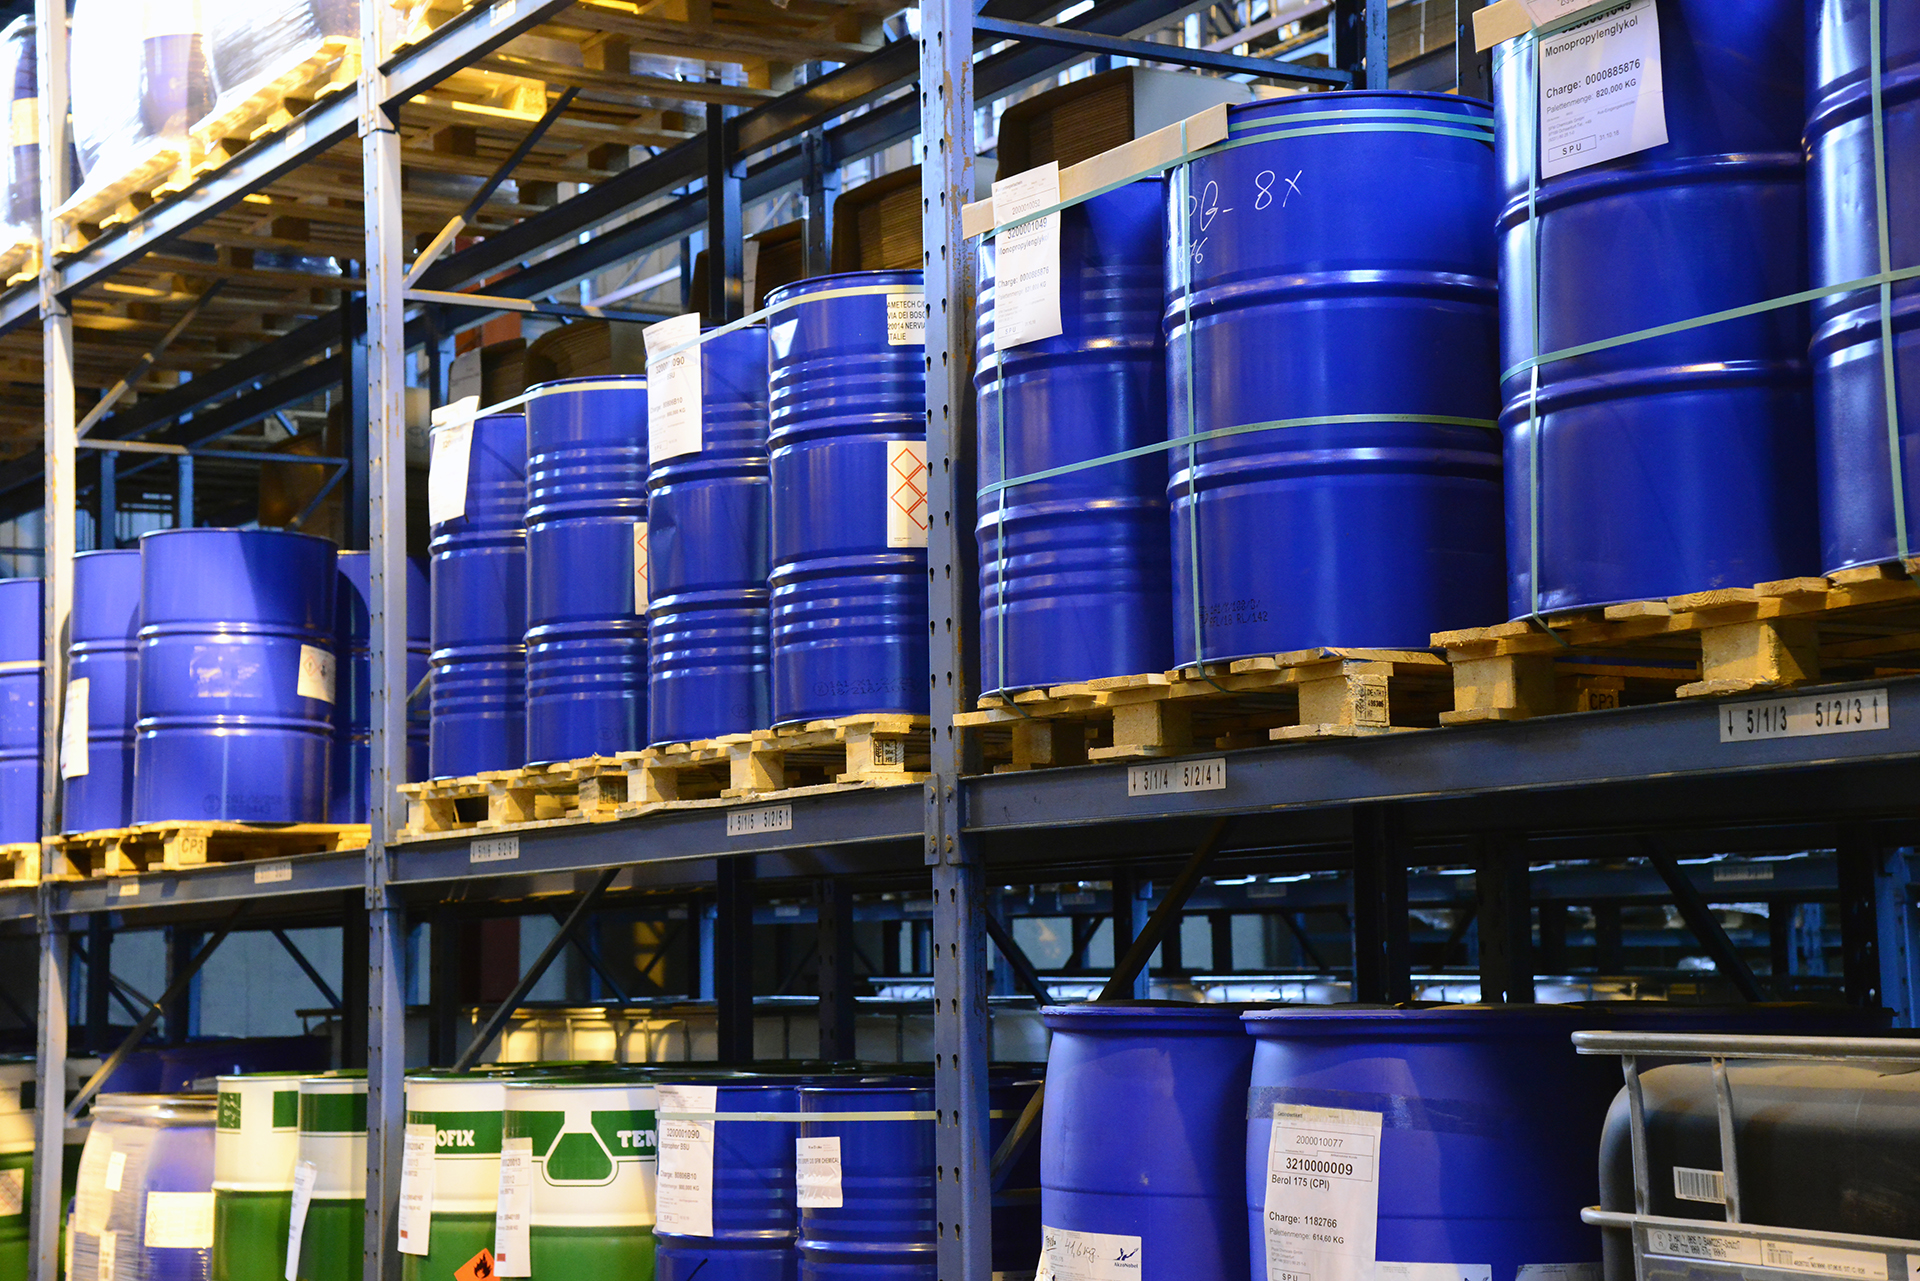 SFM_Chemicals_Konfektionierung_Blau_Faesser